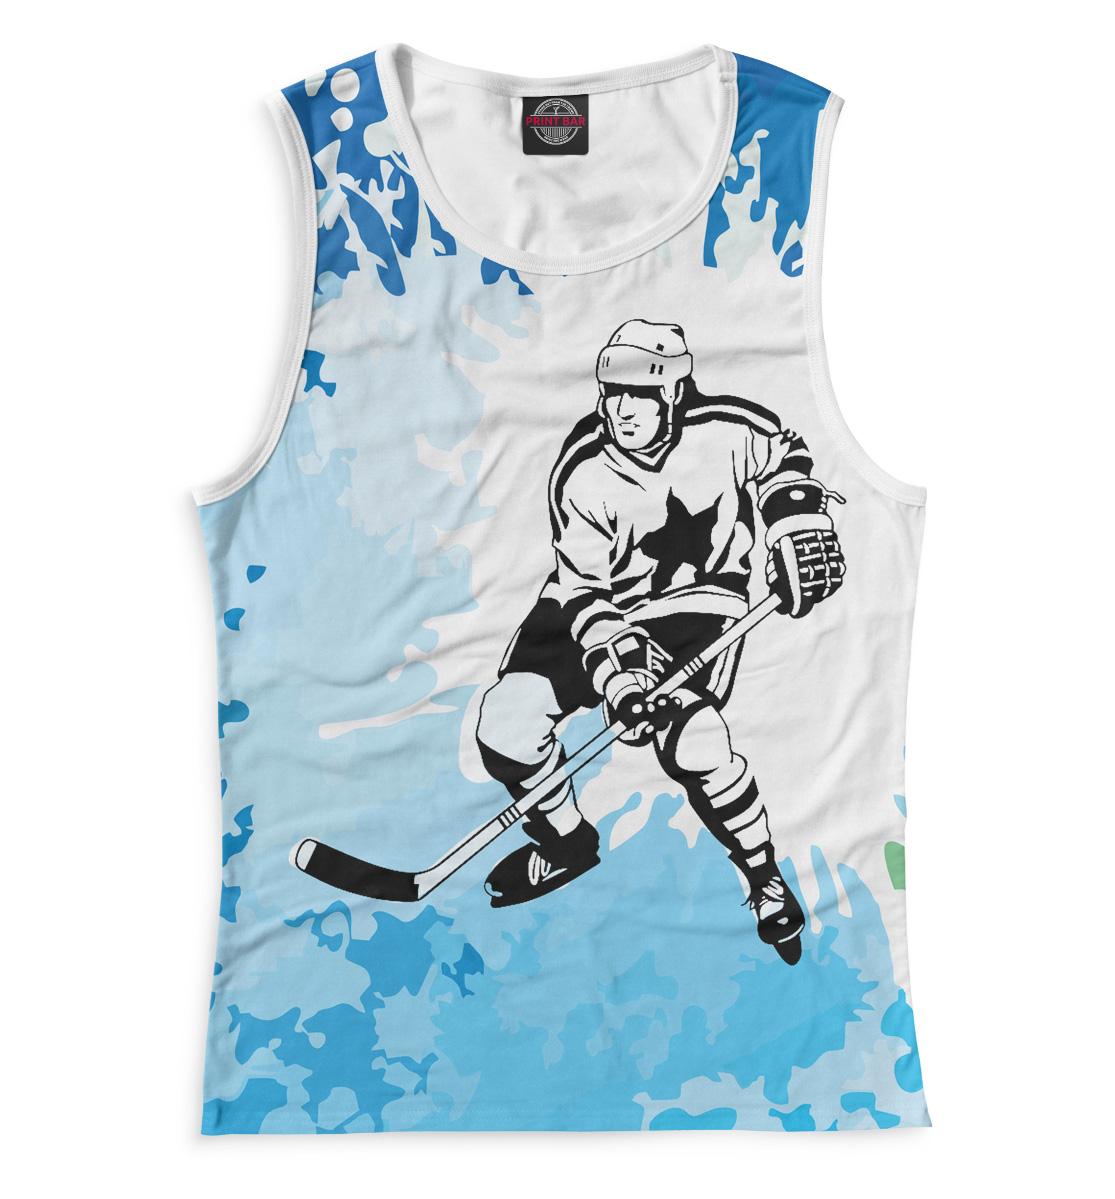 Купить Хоккей, Printbar, Майки, HOK-724098-may-1